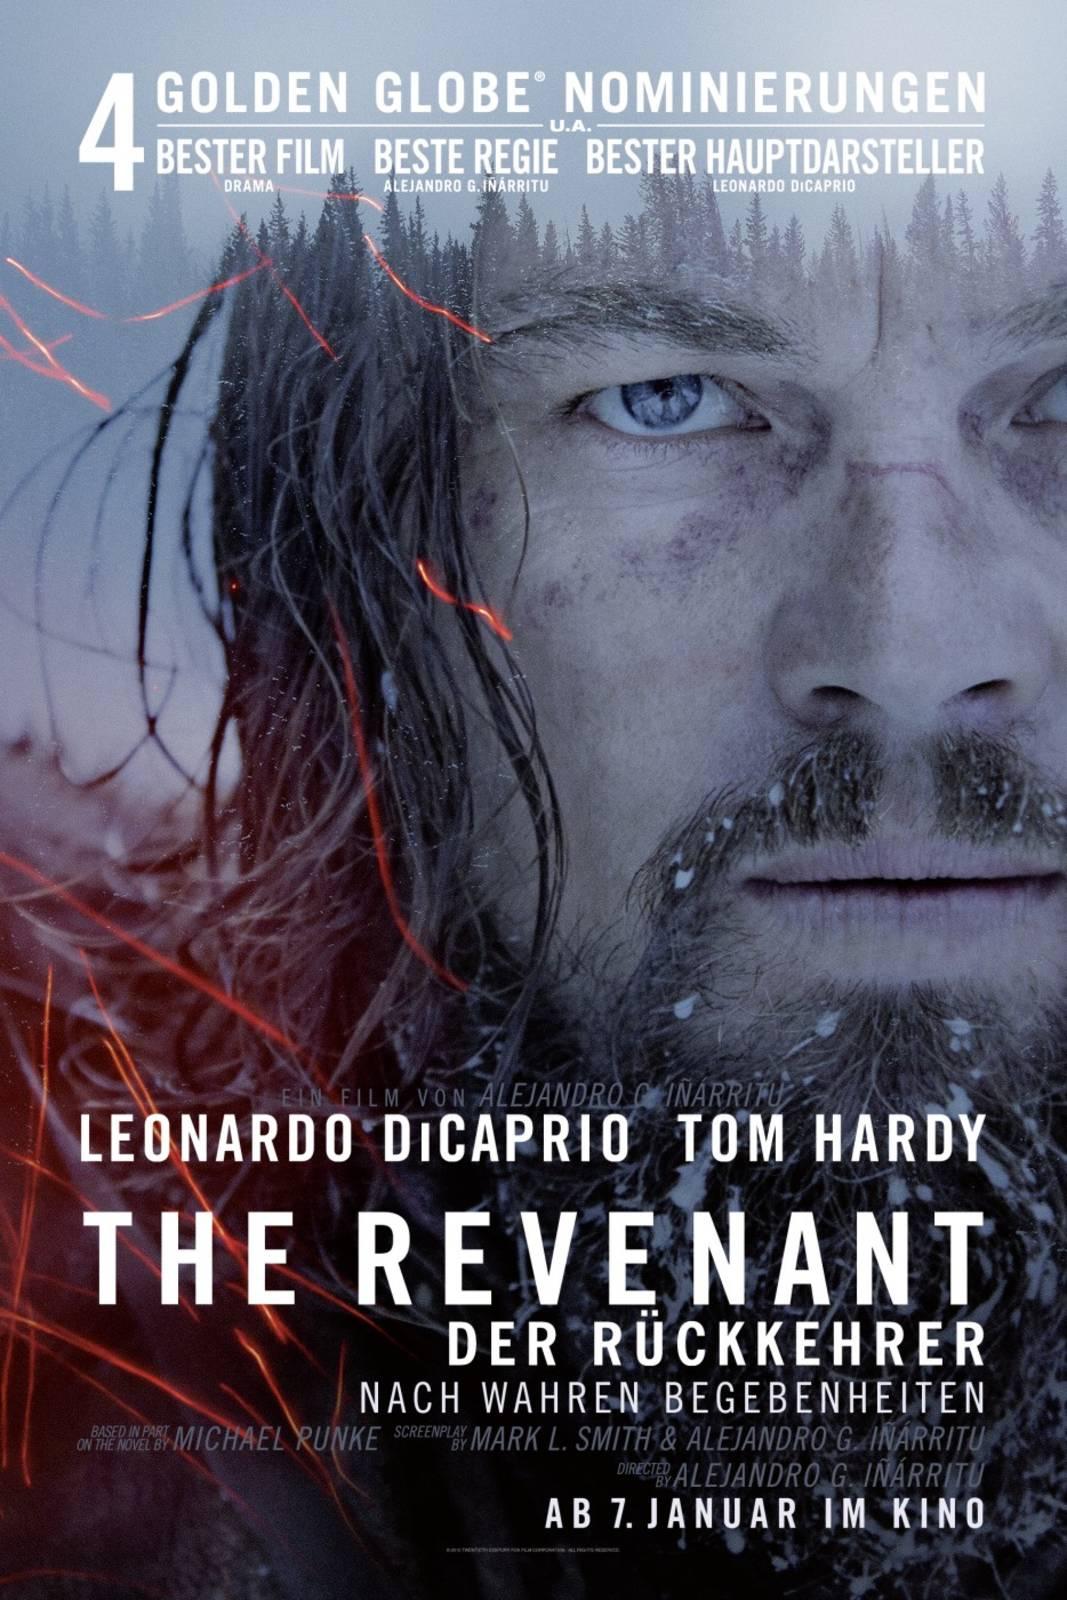 The Revenant - Der Rueckkehrer